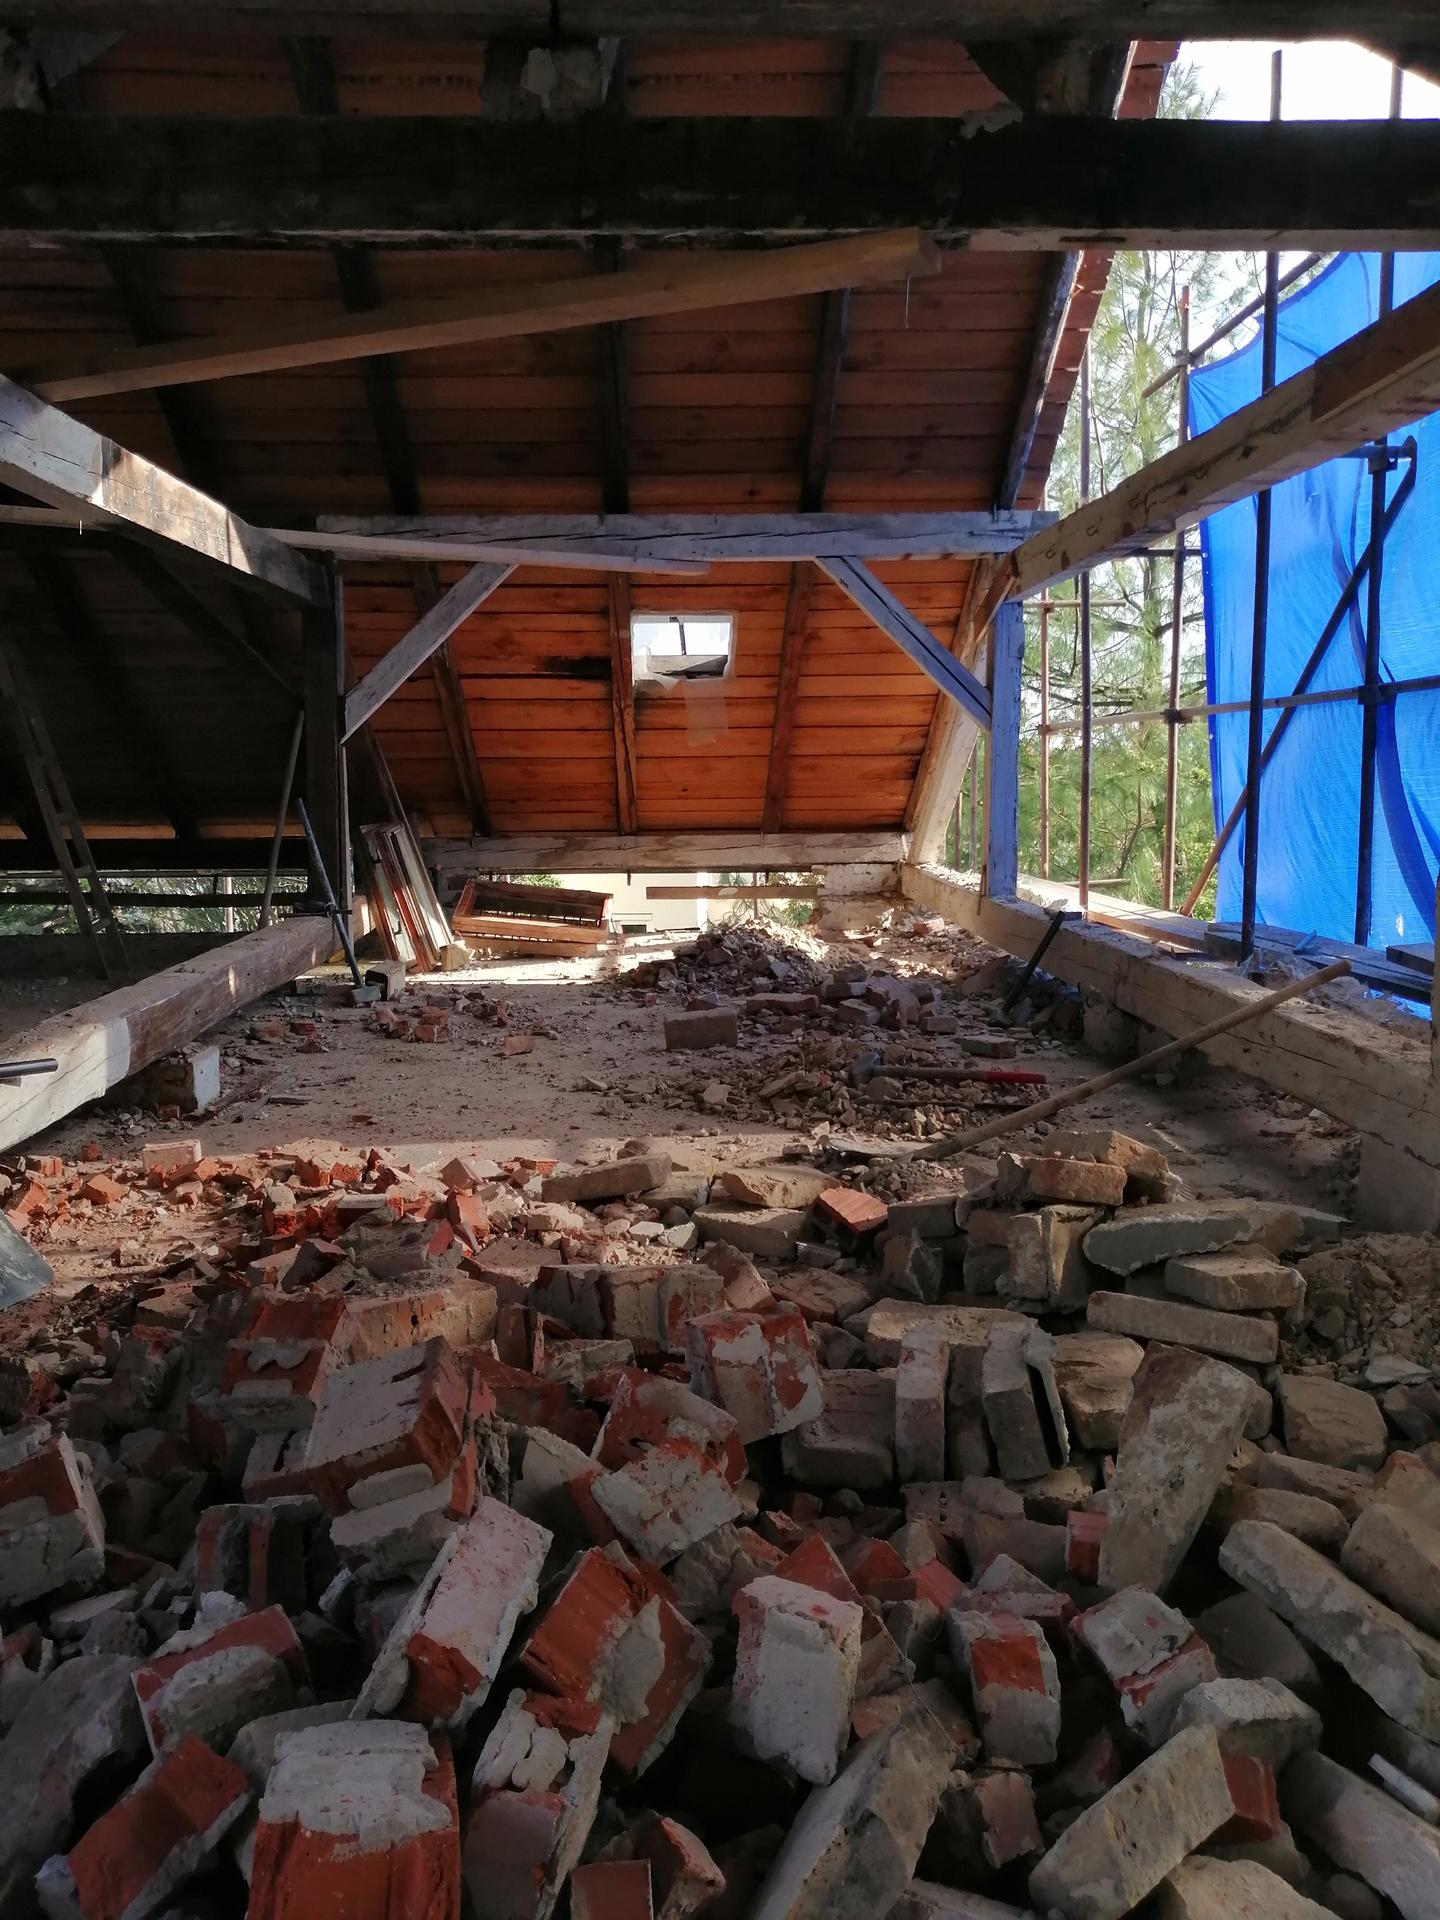 Prestavba podkrovia zo sedlovo valbovej na sedlovú strechu. - Obrázok č. 46